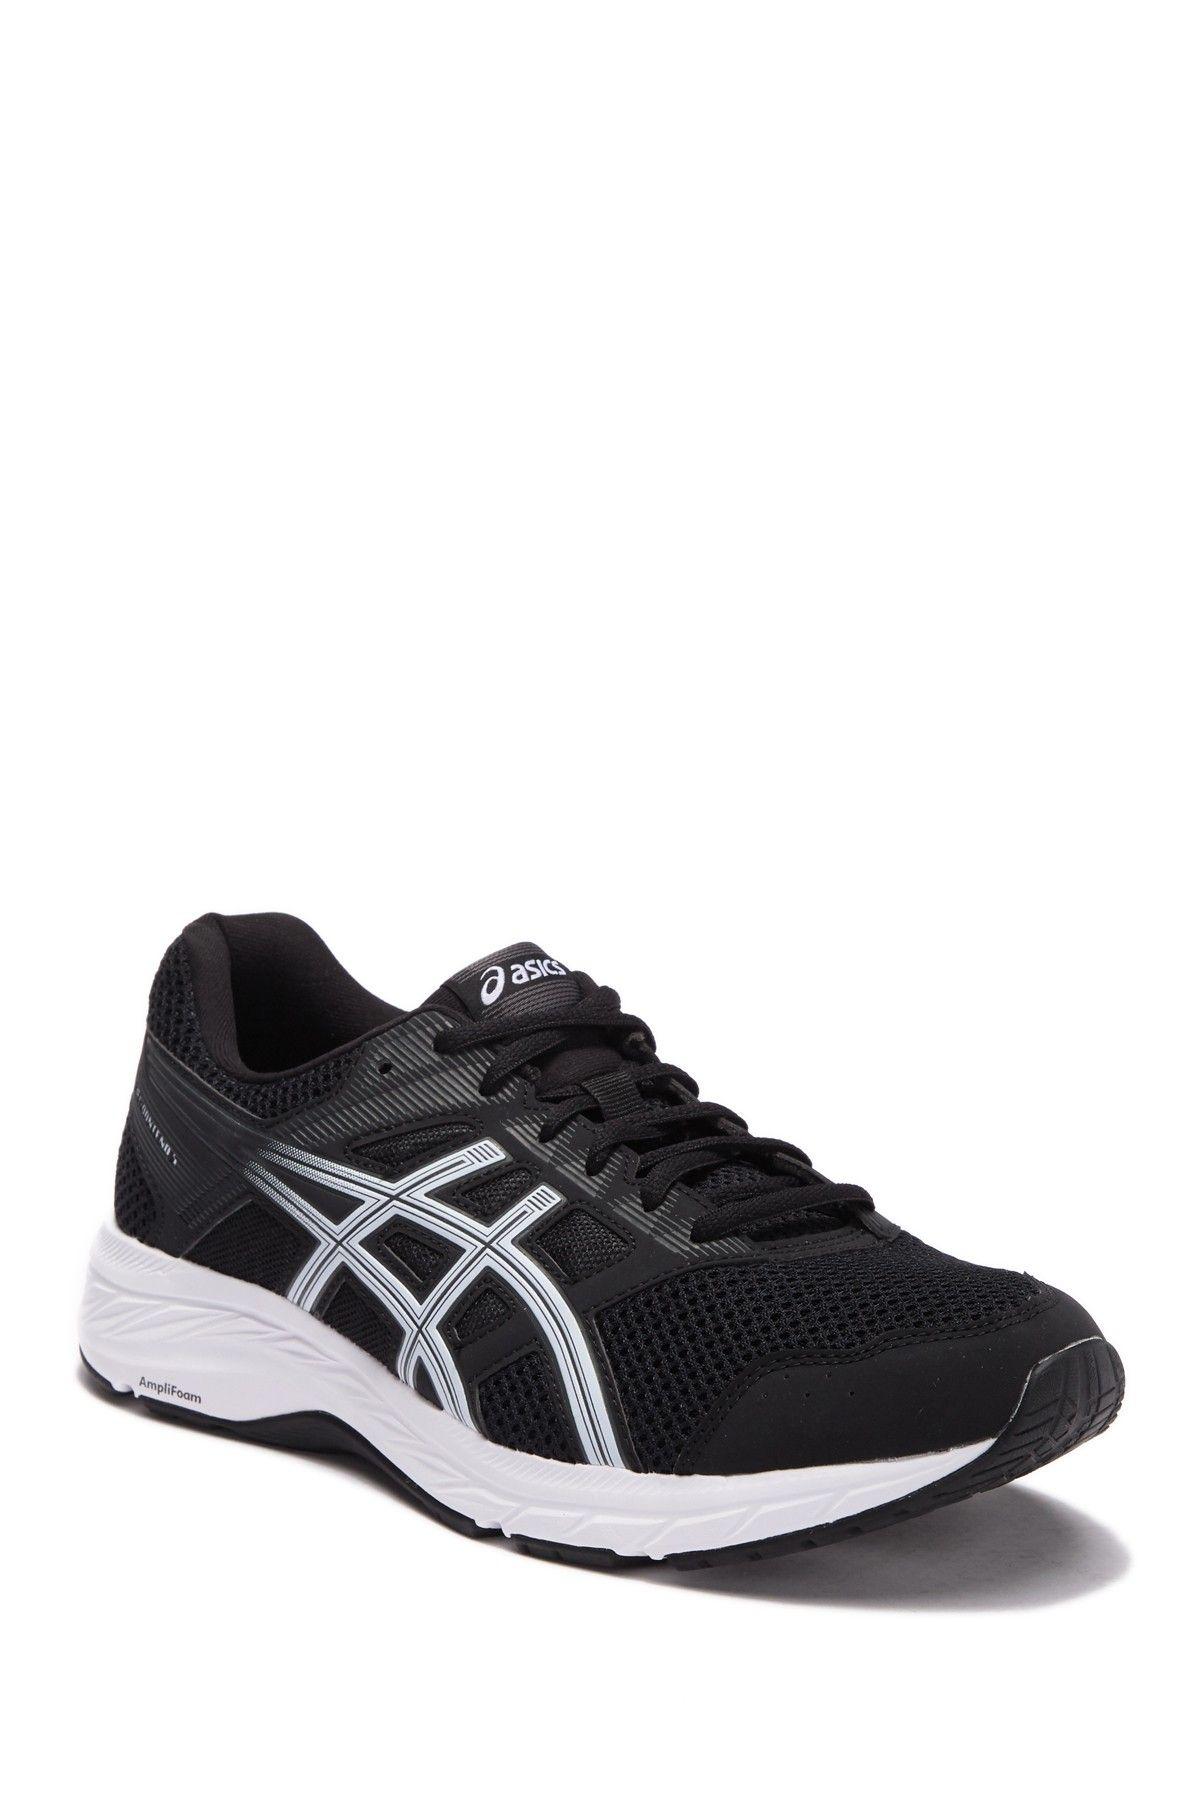 Asics Men/'s GEL-Contend 5 Black White Mesh fashion-sneakers